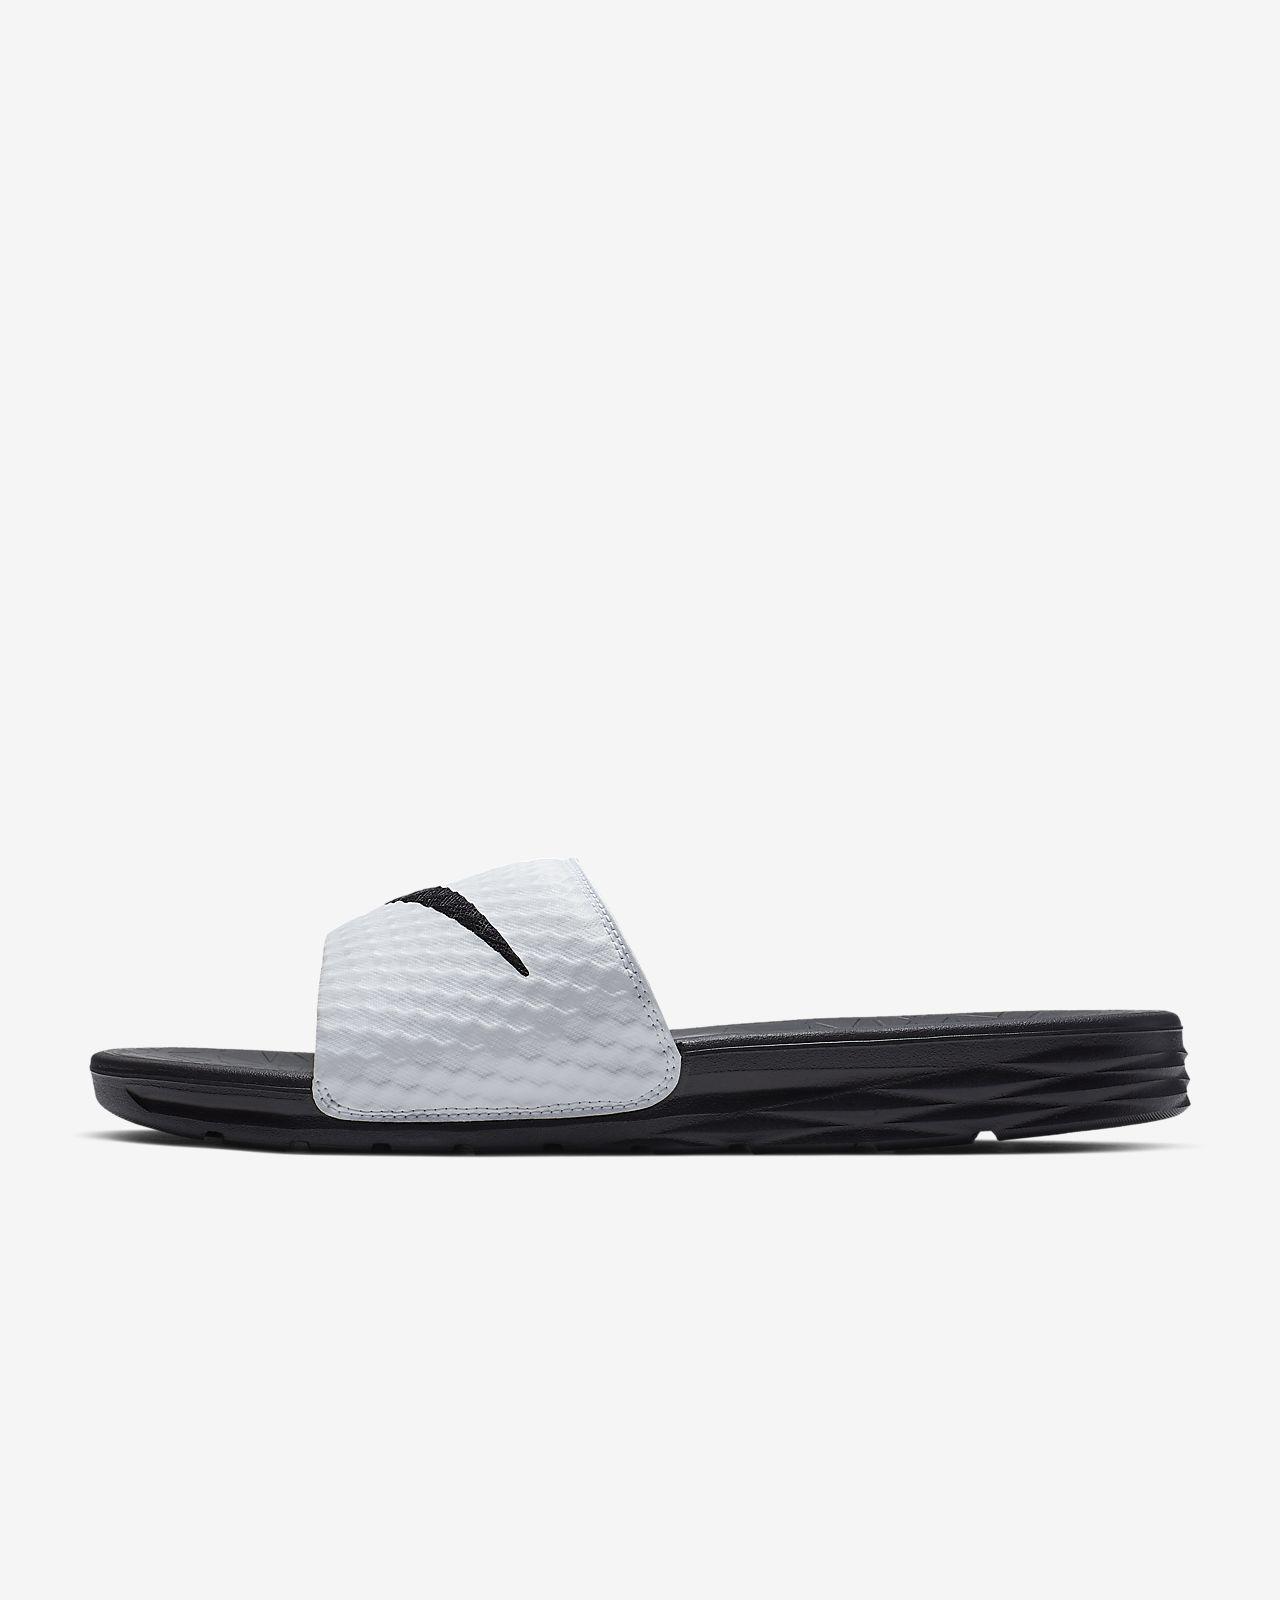 5cfcb4c4b4a3d8 Nike Benassi Solarsoft 2 Men s Slide. Nike.com AU